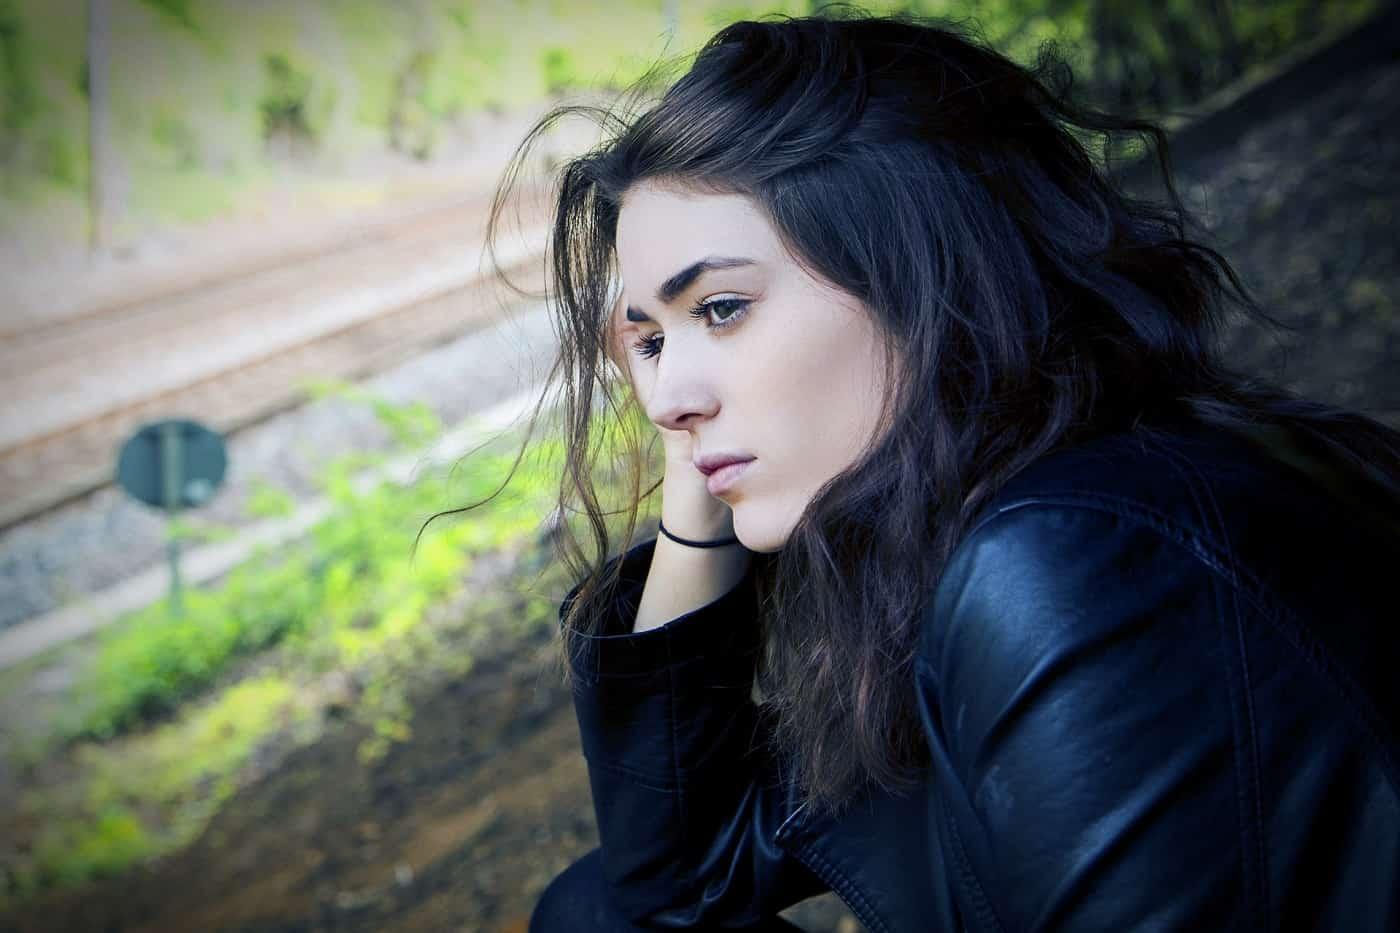 Sad brunette woman sitting outside